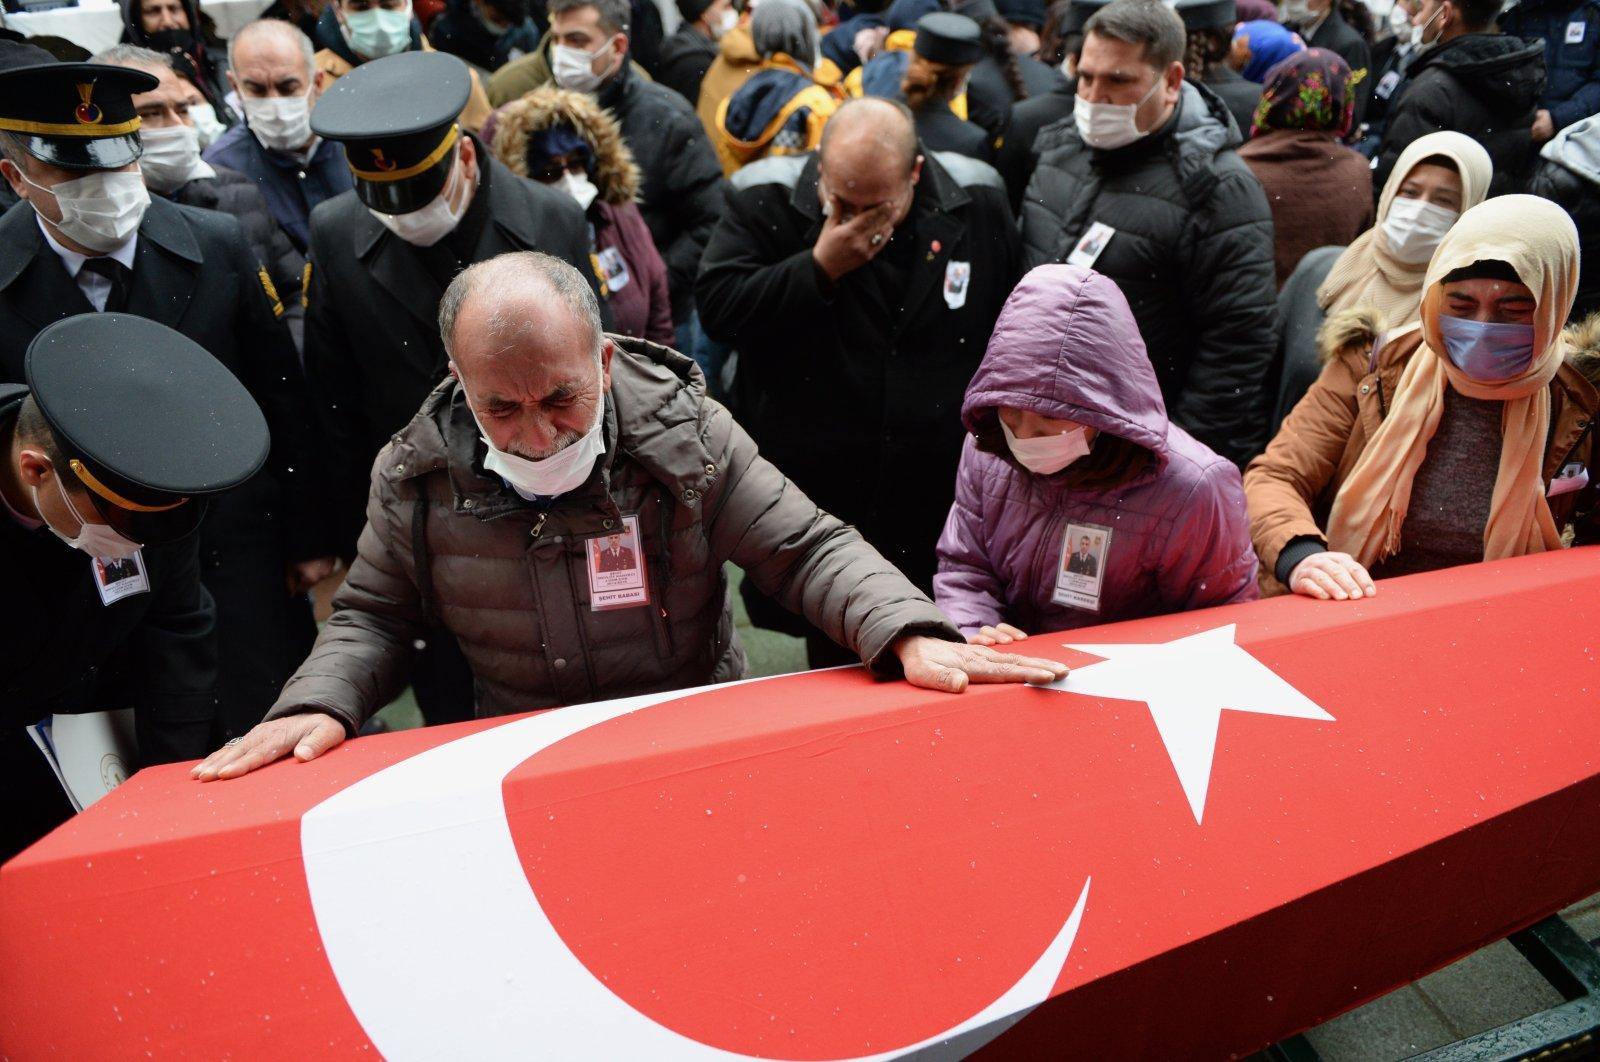 The funeral of Gendarmerie Specialist Sgt. Mevlüt Kahveci who was executed by the PKK terrorist group in northern Iraq's Gara region, in Eskişehir, Turkey, Feb. 15, 2021. (AA Photo)